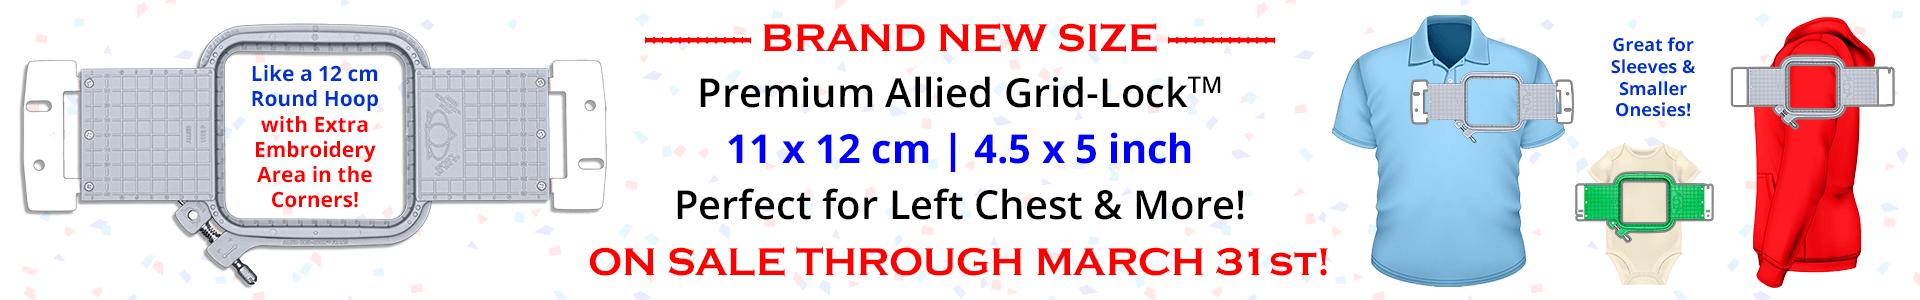 ON SALE - NEW Premium Allied Grid-Lock 11 x 12 cm (4.5 x 5 inch) Hoops!